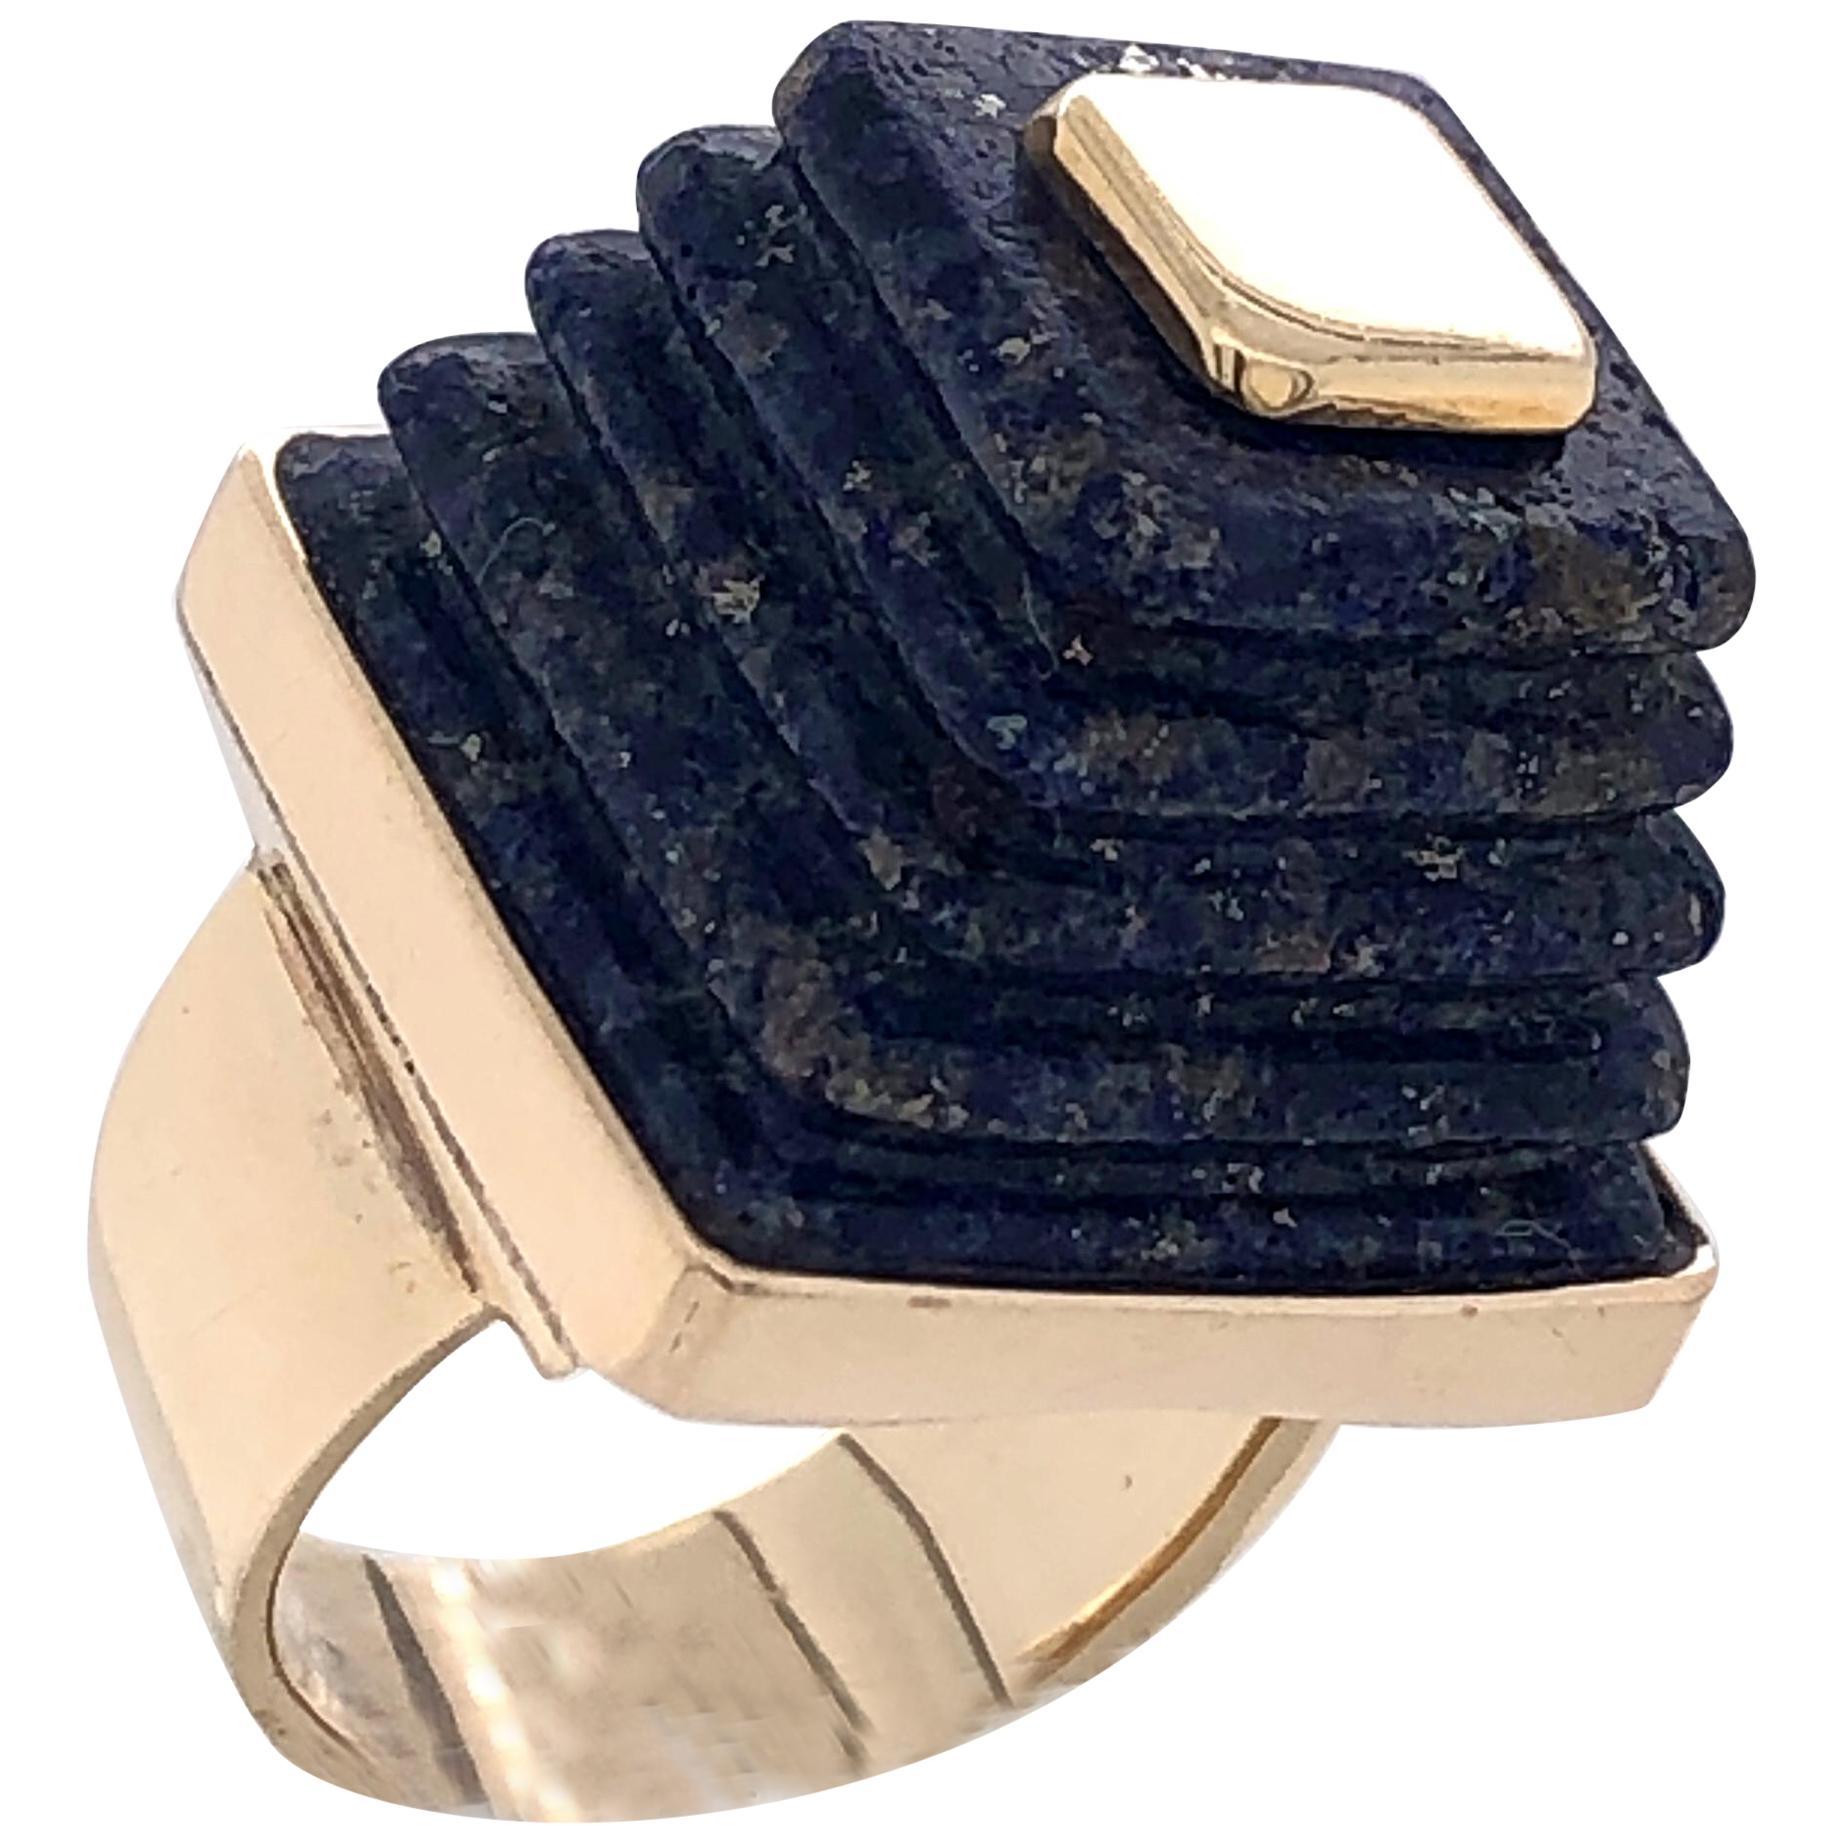 Gold and Lapis Lazuli Pyramid Ring, 1970s